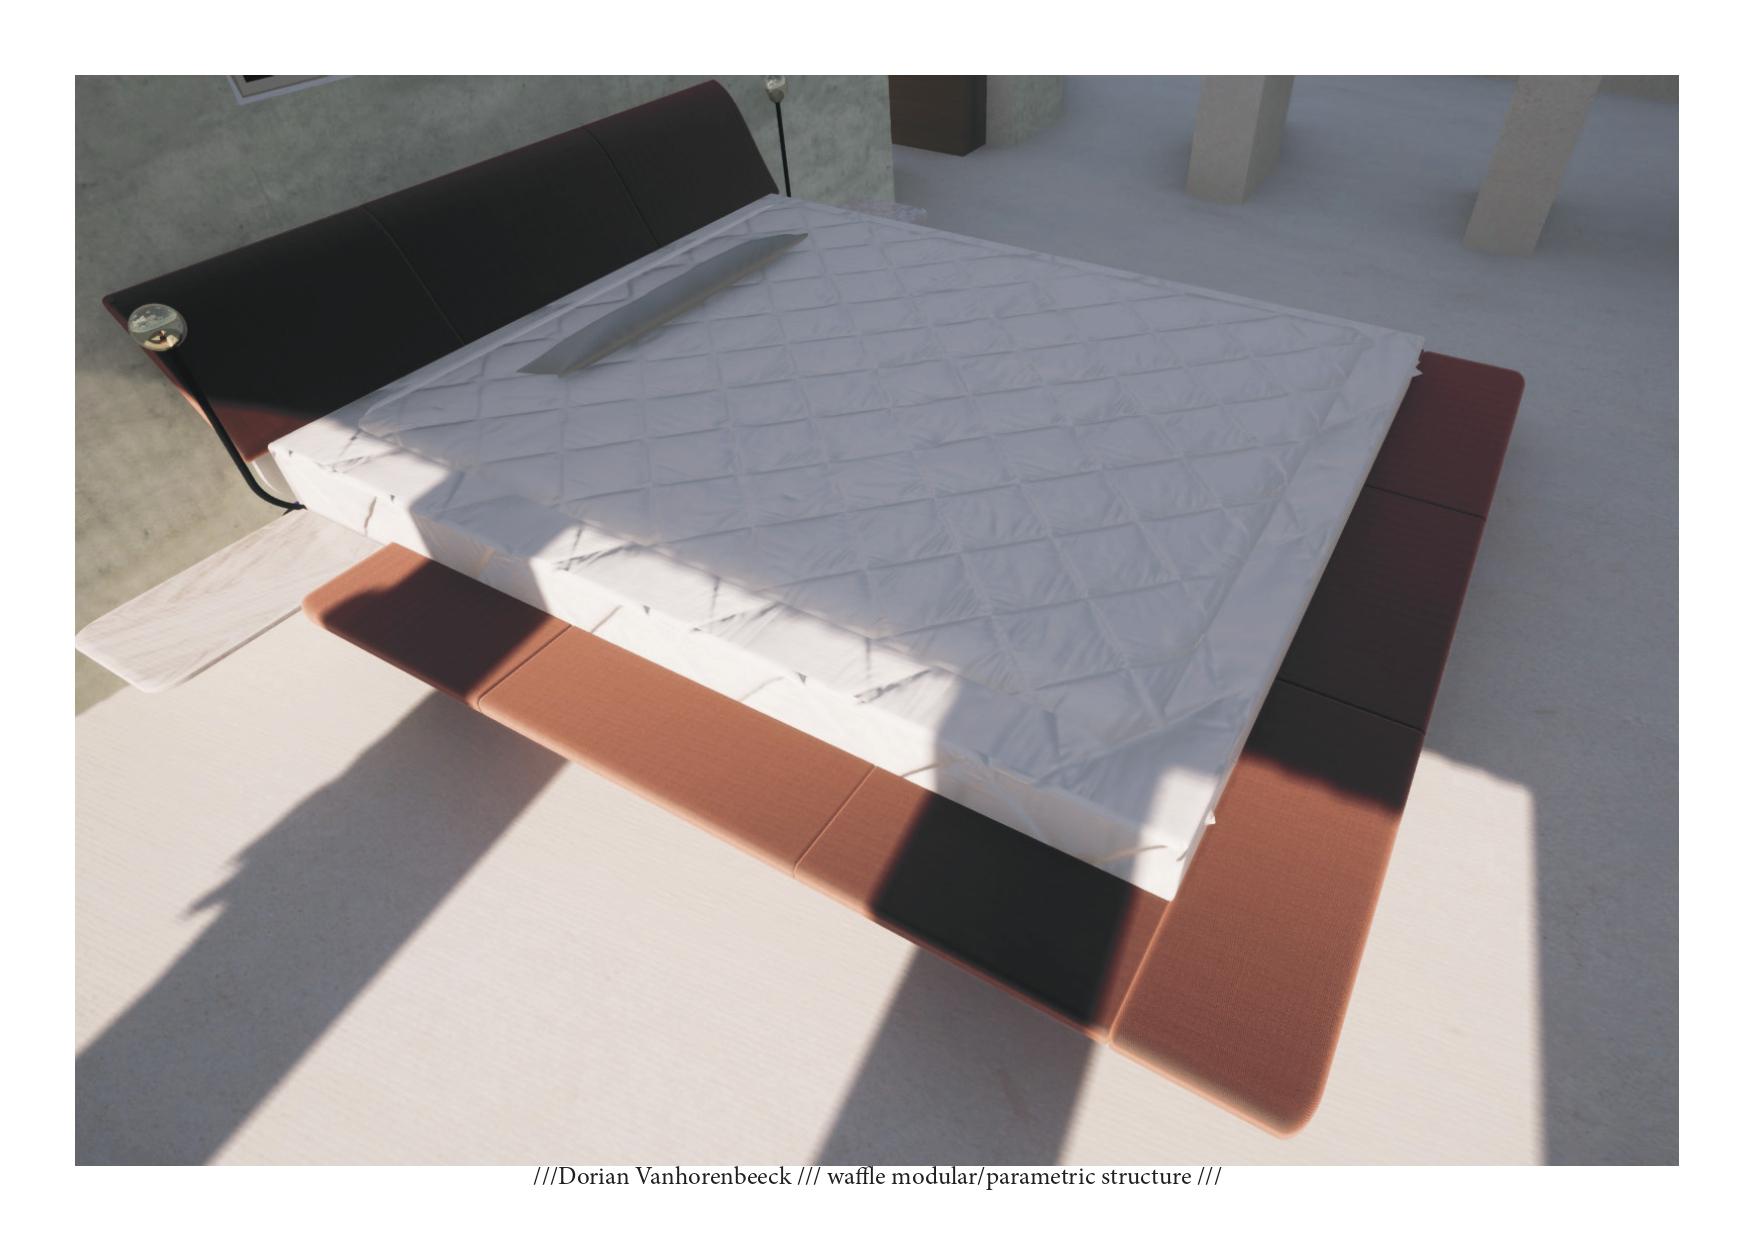 Livret Waffle modular-parametric Structure Dorian Vanhorenbeeck_page-0017